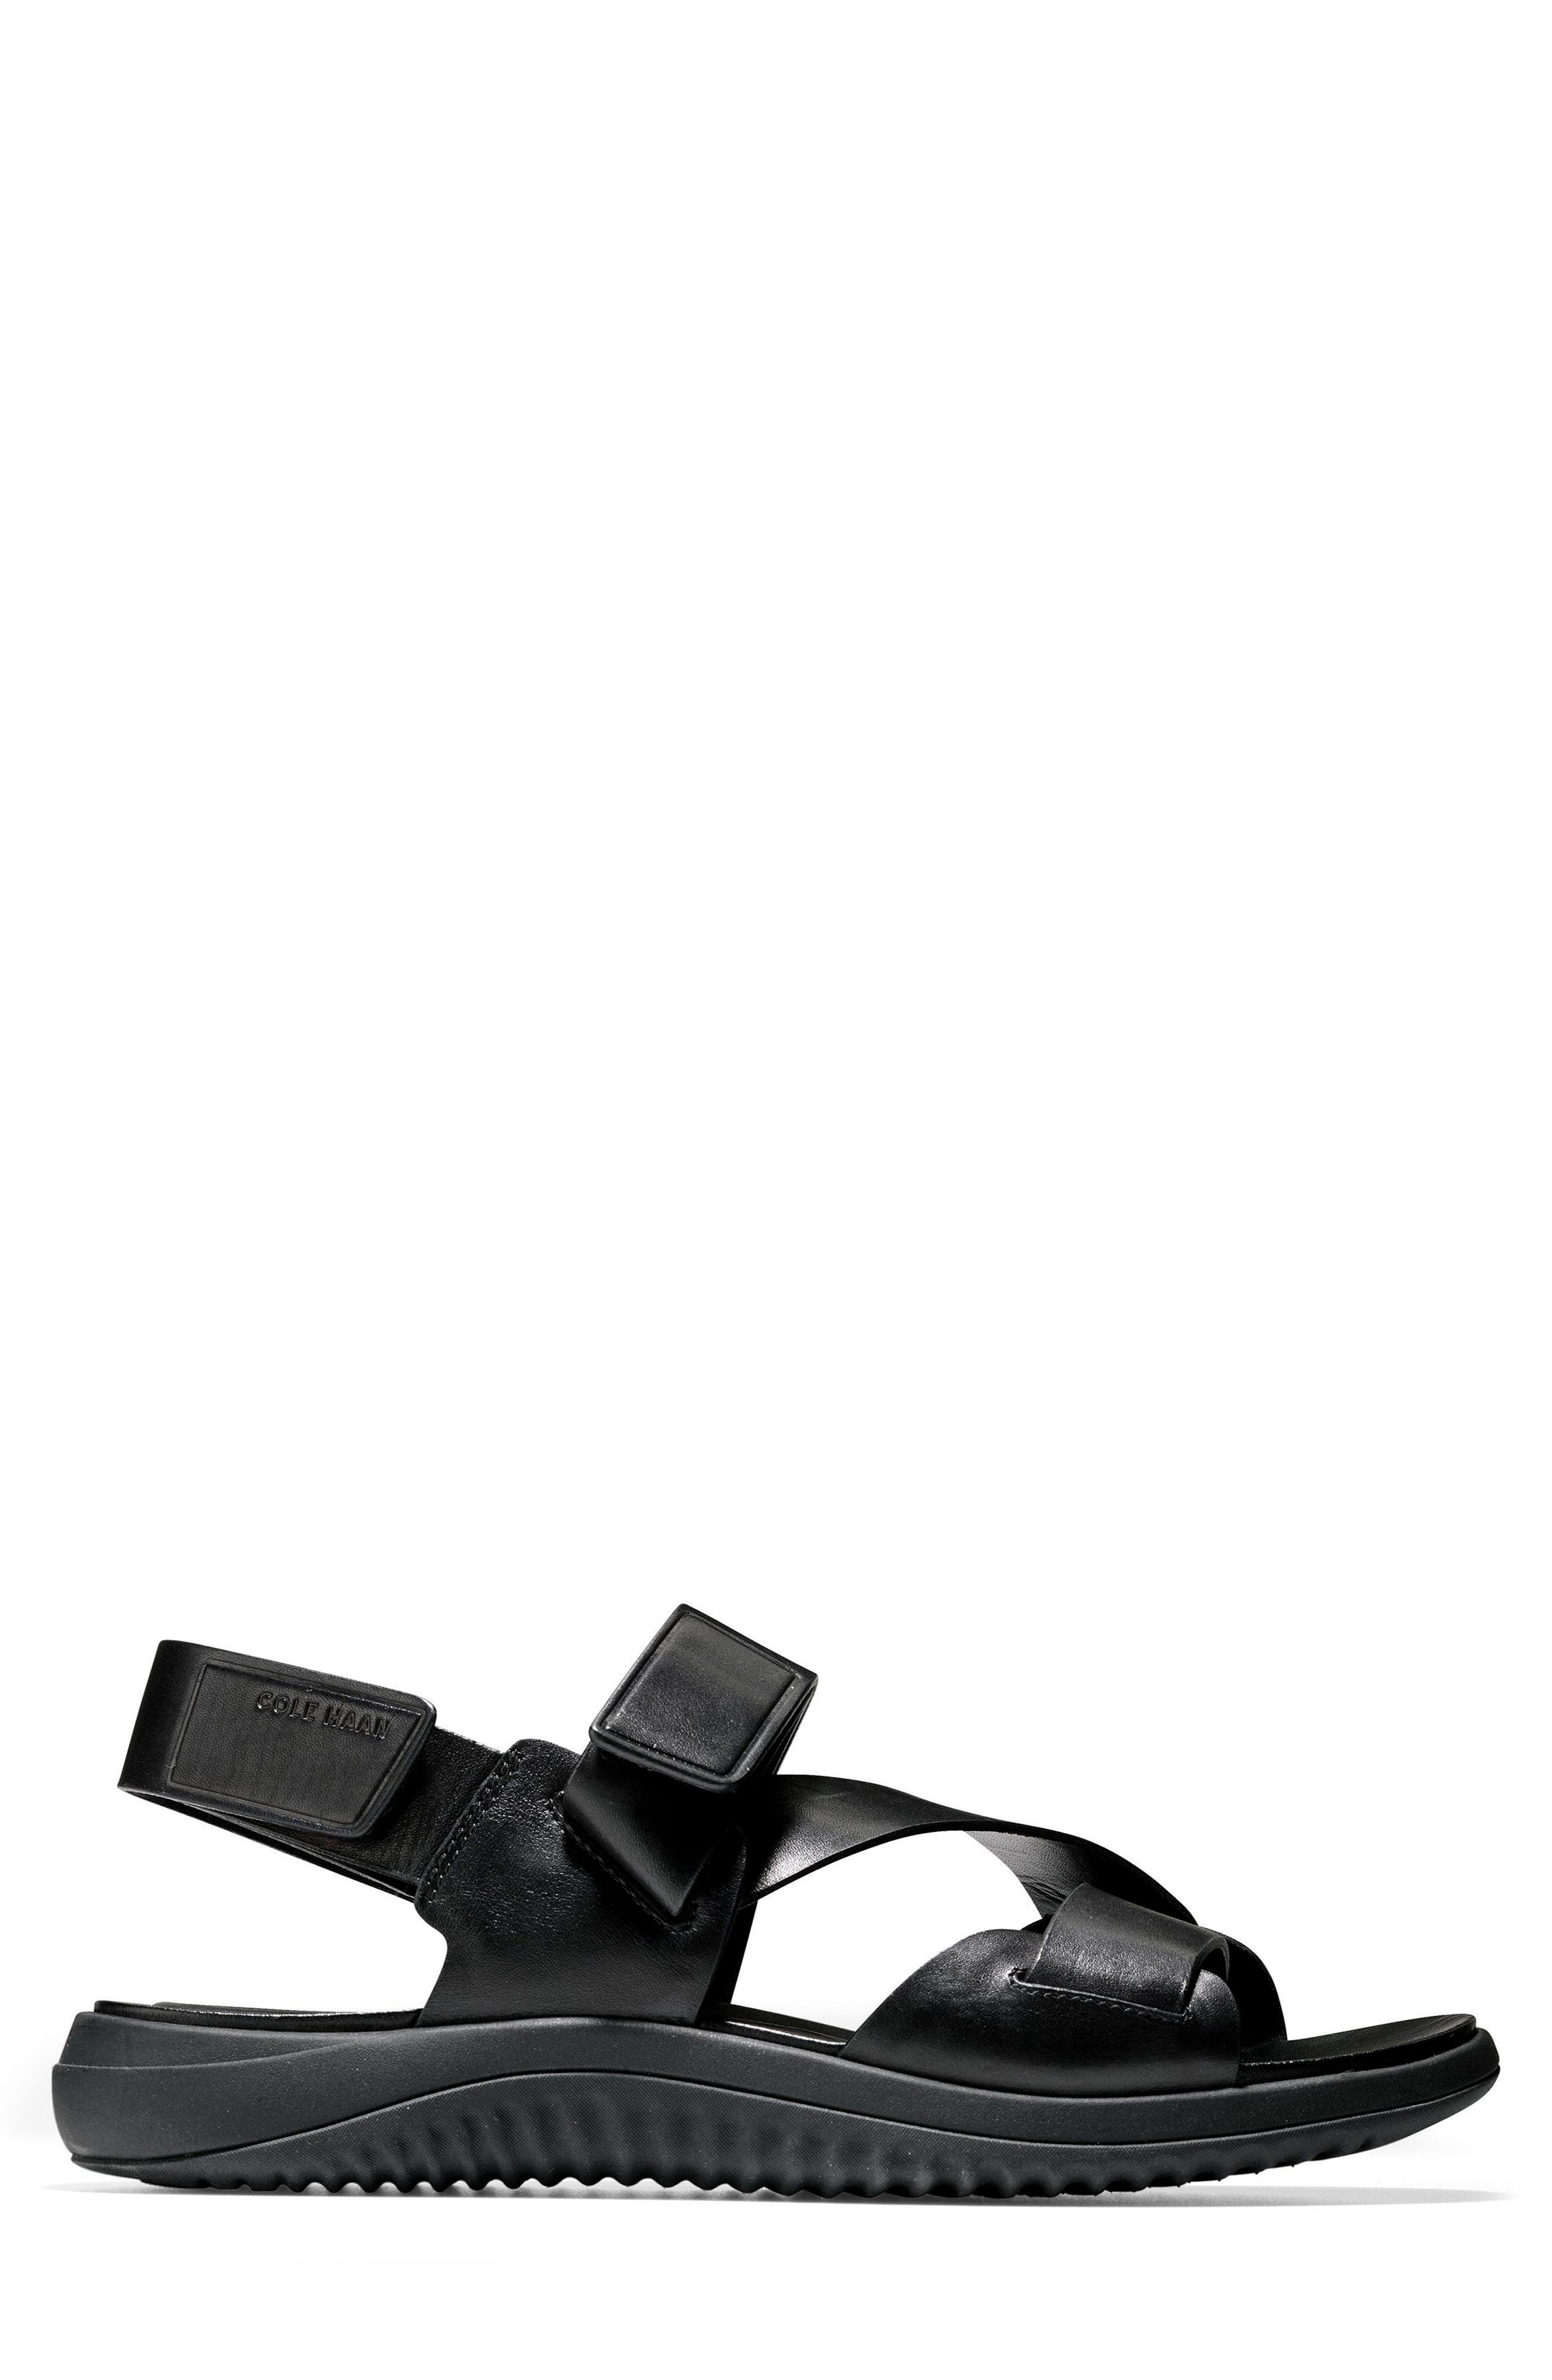 2.ZeroGrand Multistrap Sandal,                             Alternate thumbnail 3, color,                             003